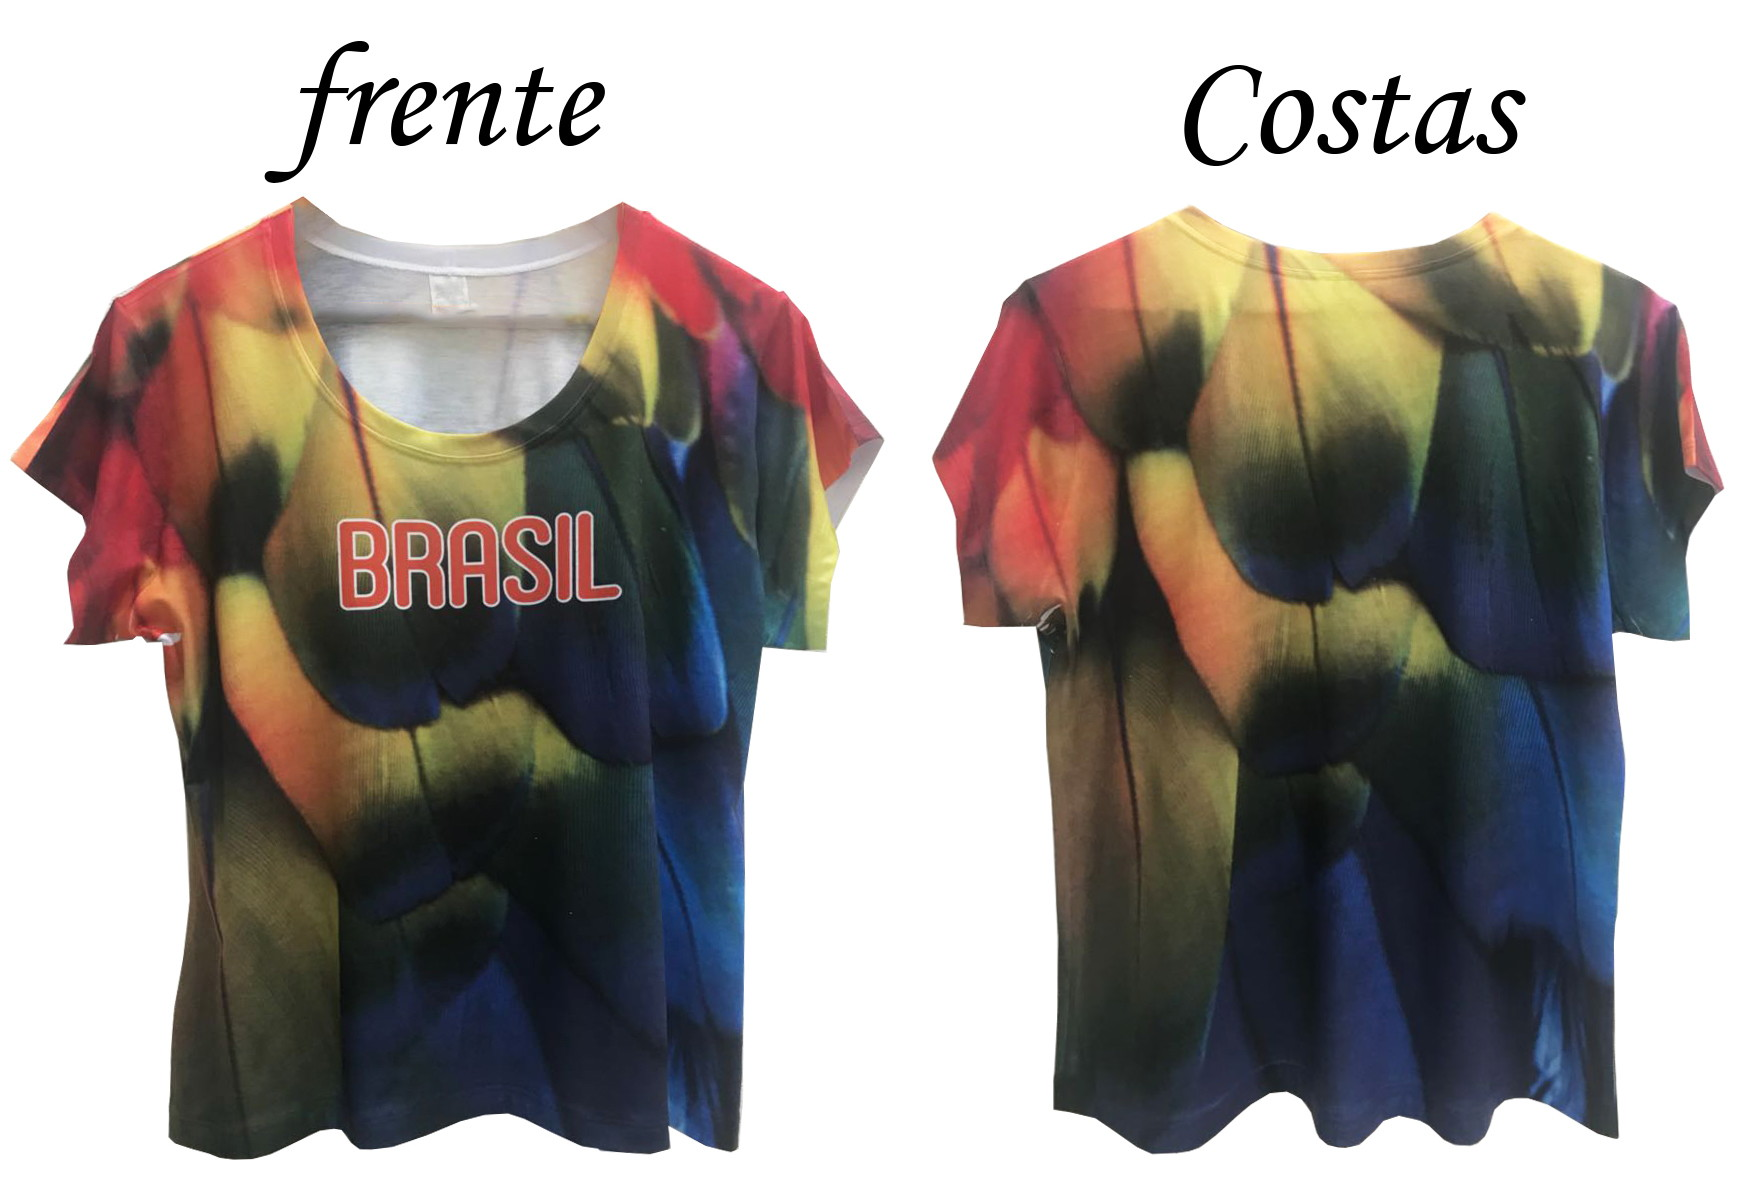 T Shirt Personalizada Feminina Copa Brasil Estampa Cheia no Elo7 ... baea16a501dad